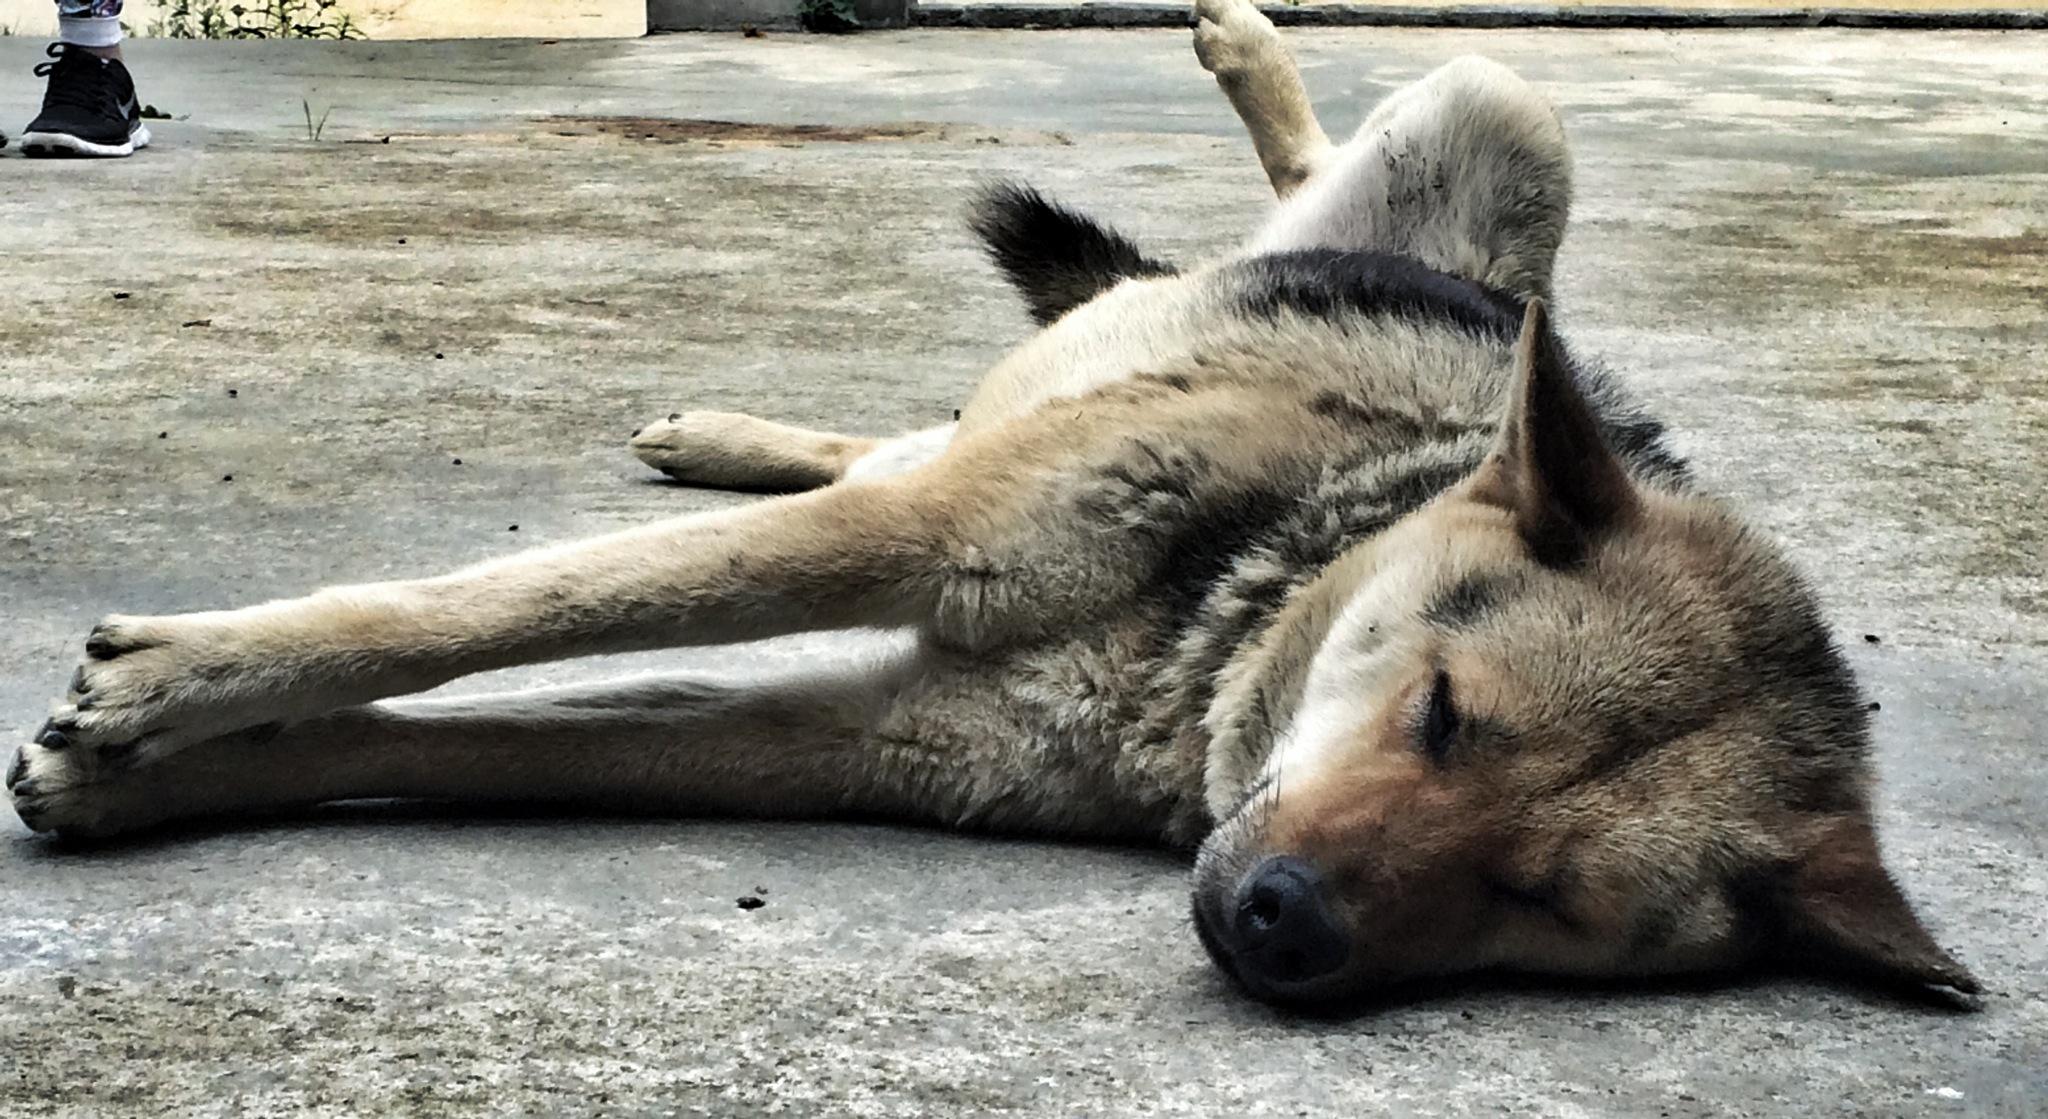 lazy street dog enjoying the sun